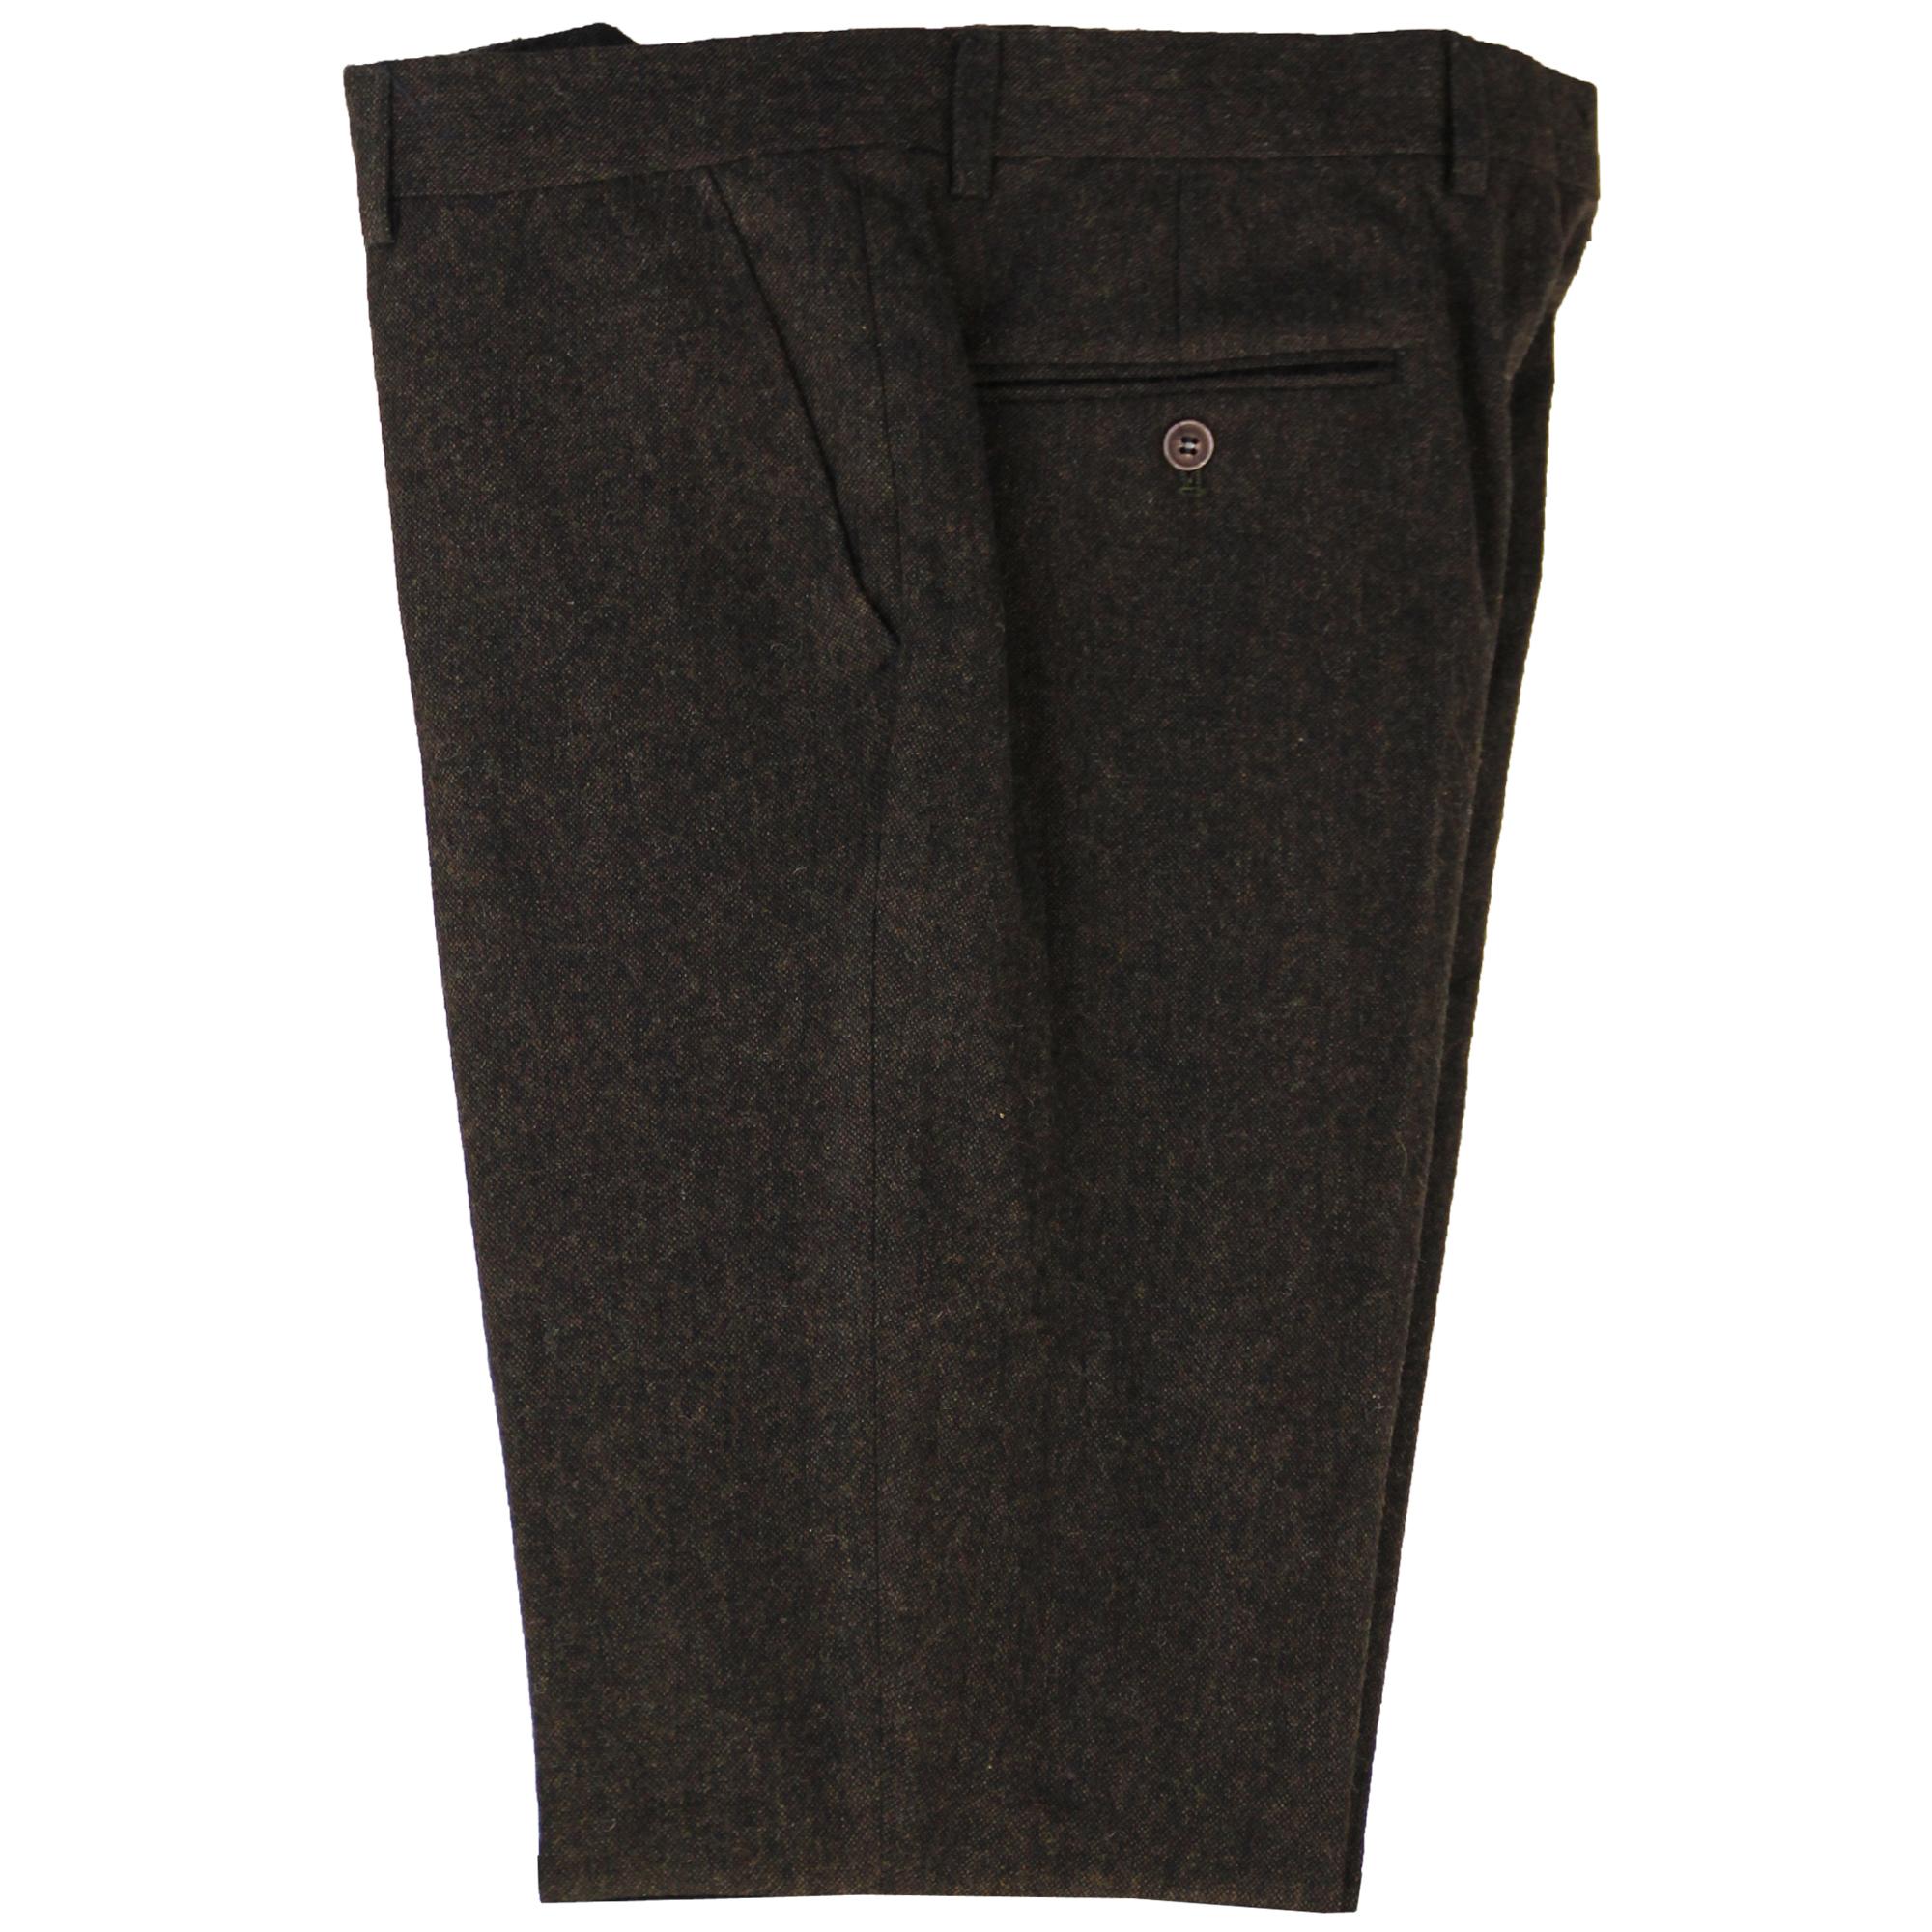 Mezcla-de-lana-para-hombre-3-piezas-trajes-mareno-Blazer-Chaqueta-pantalones-chaleco-Fiesta-Formal miniatura 6